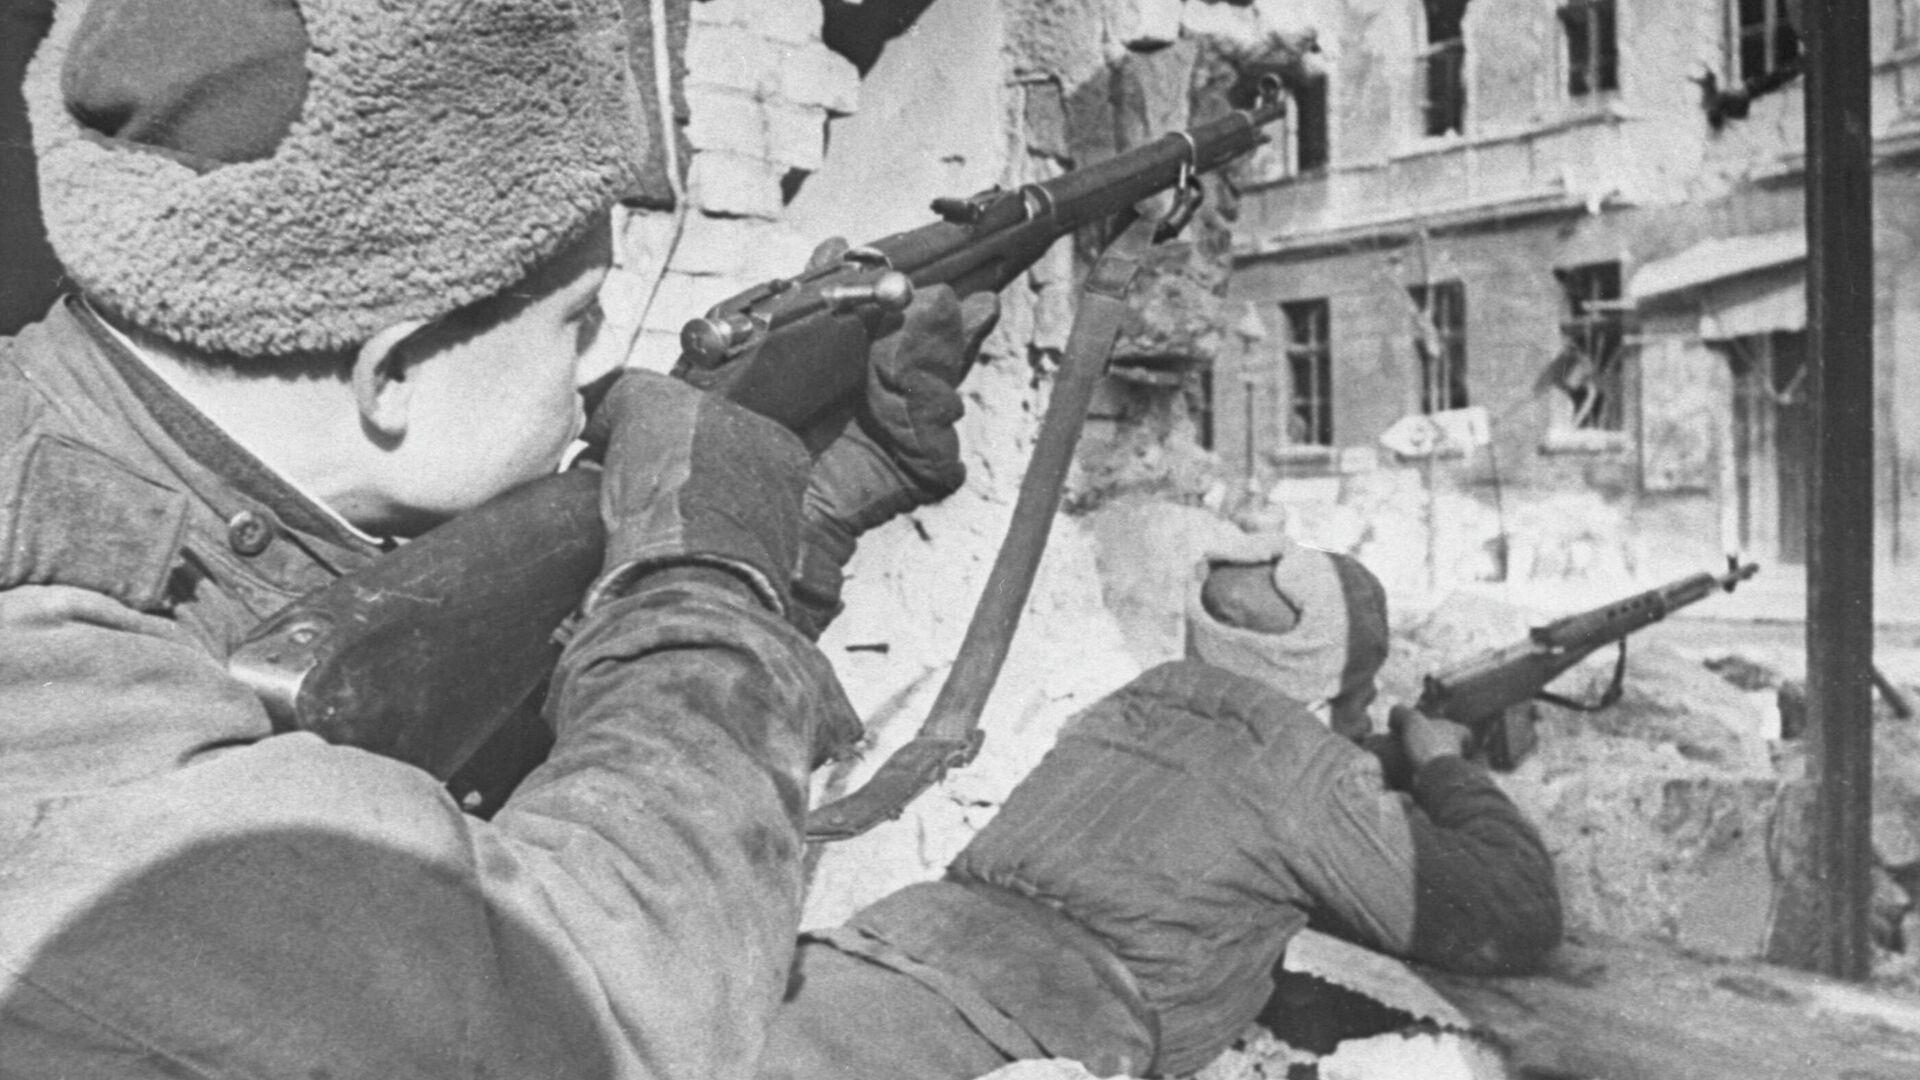 Бои на улицах Будапешта. Будапештская операция, 29 октября 1944 г. — 13 февраля 1945 г. - РИА Новости, 1920, 09.05.2021